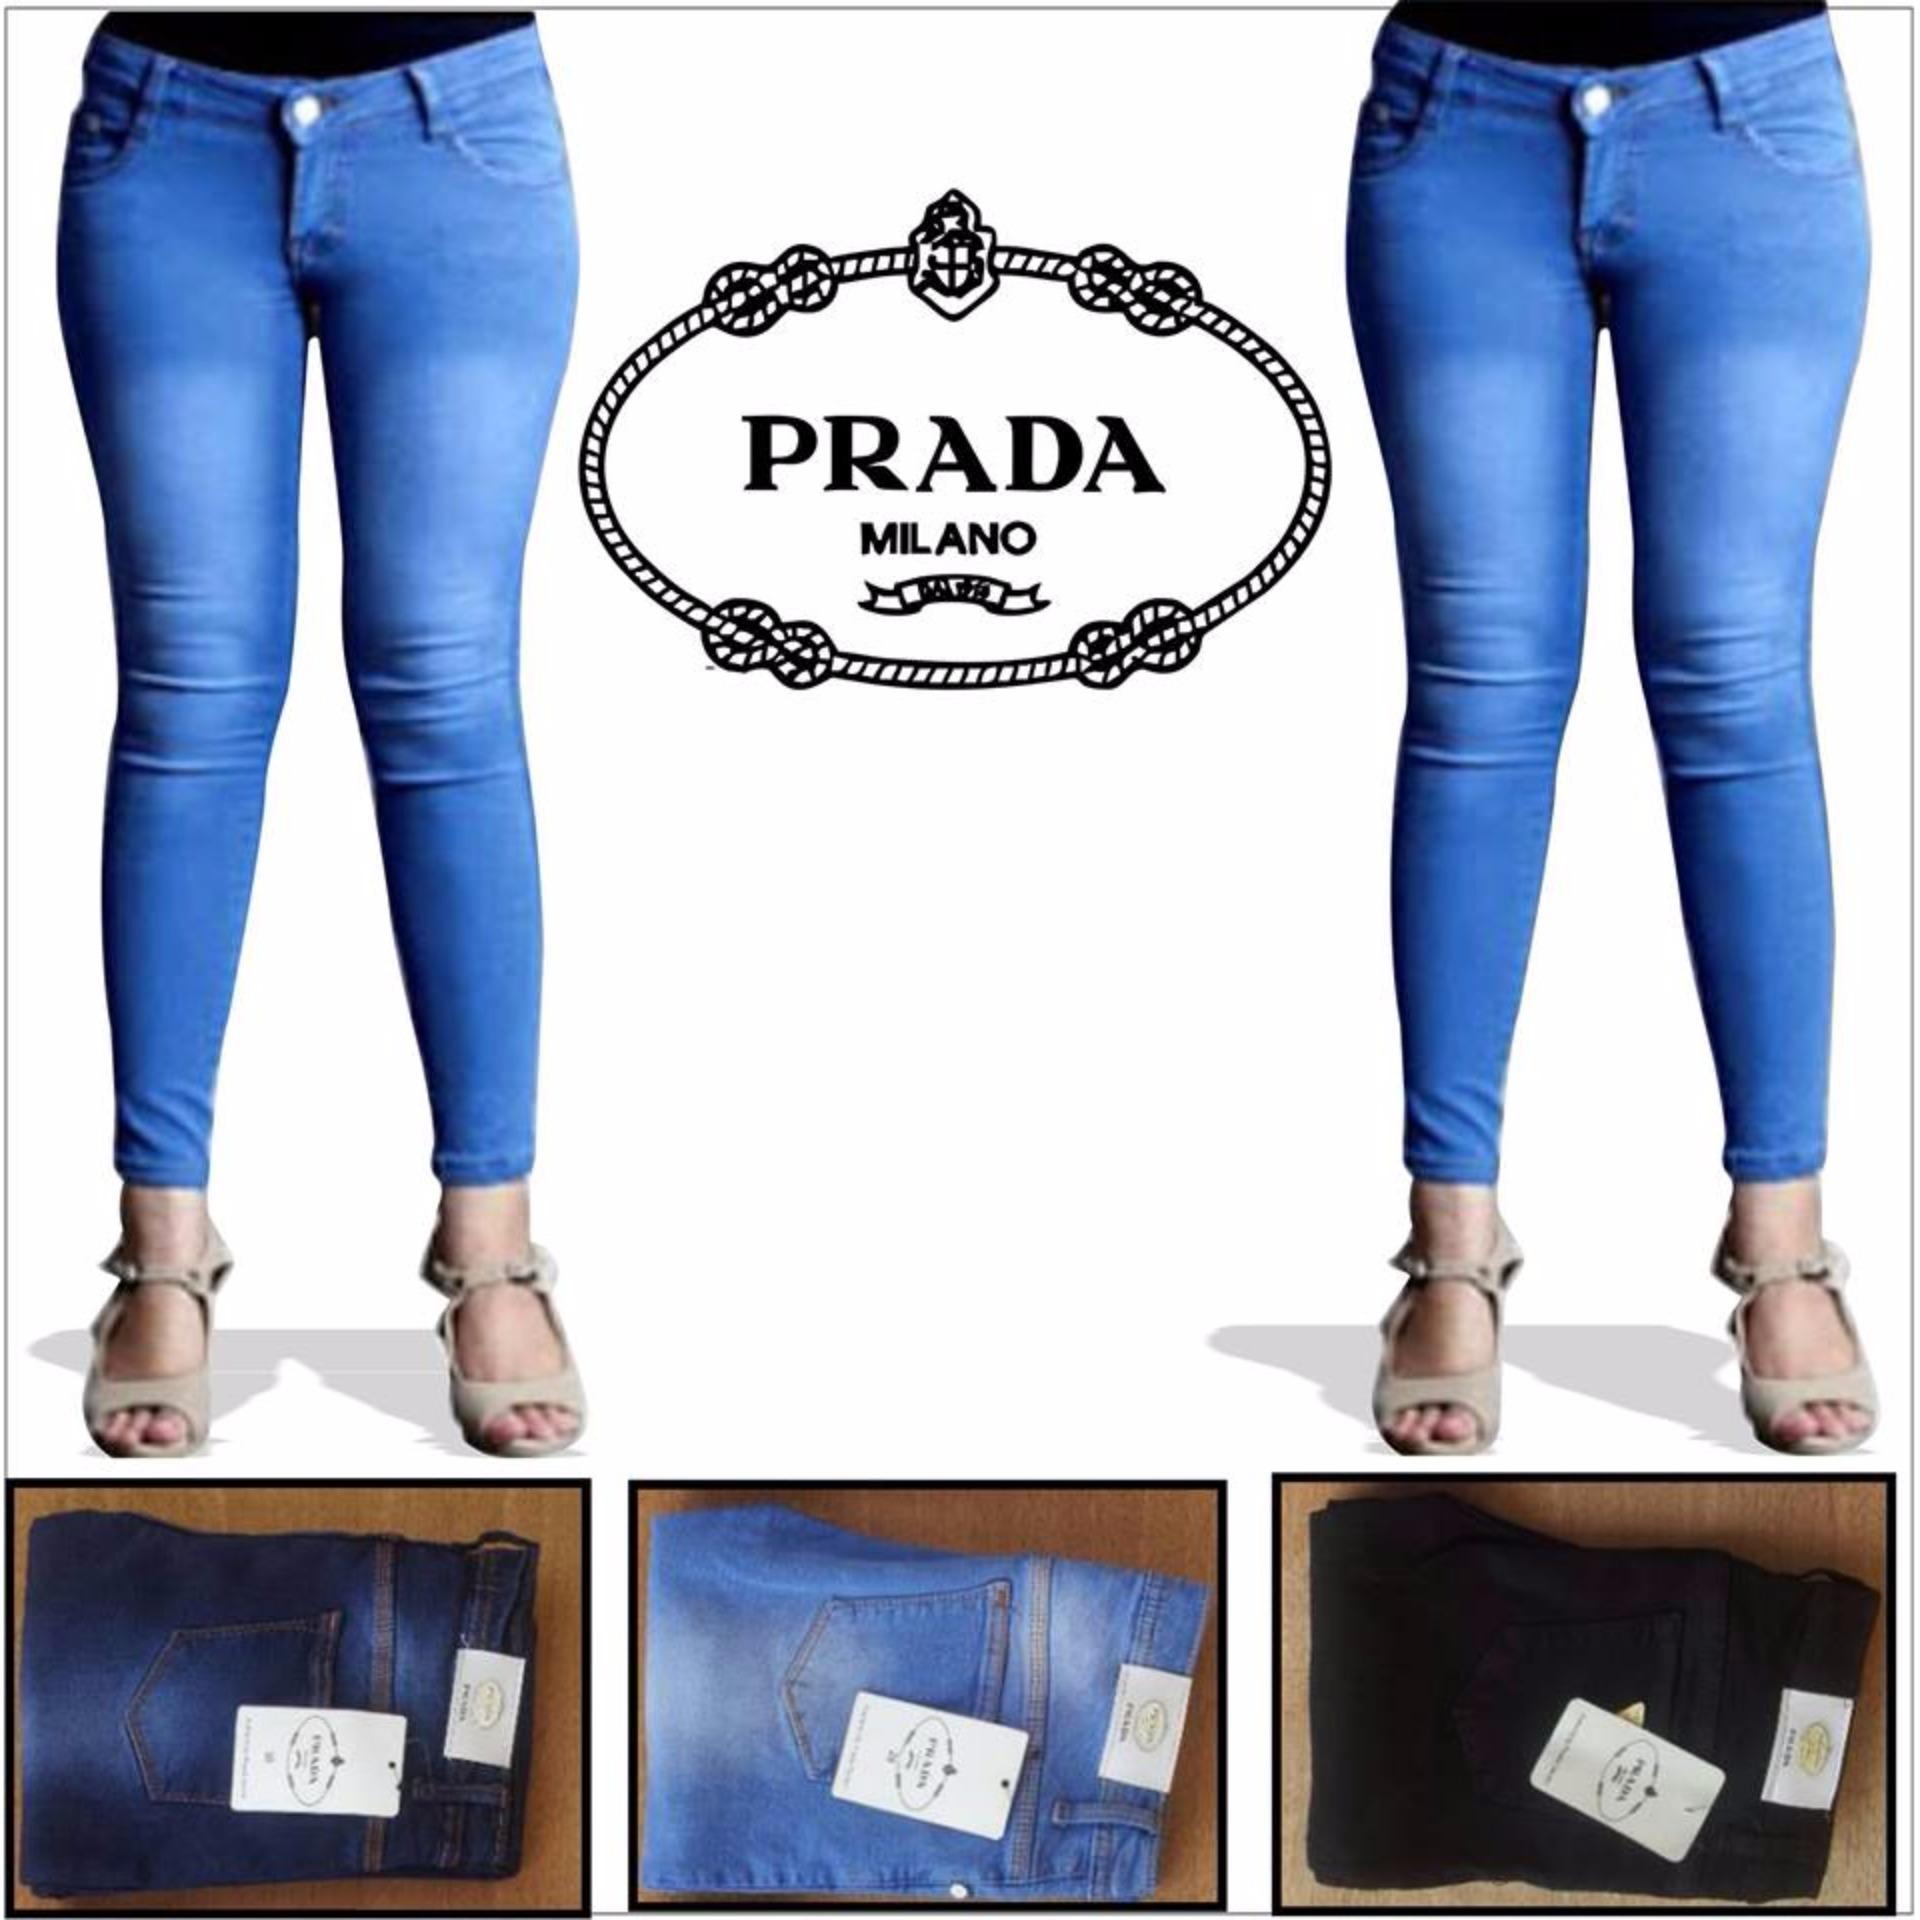 Celana jeans wanita / jeans skinny women/jeans wanita/jeans prada